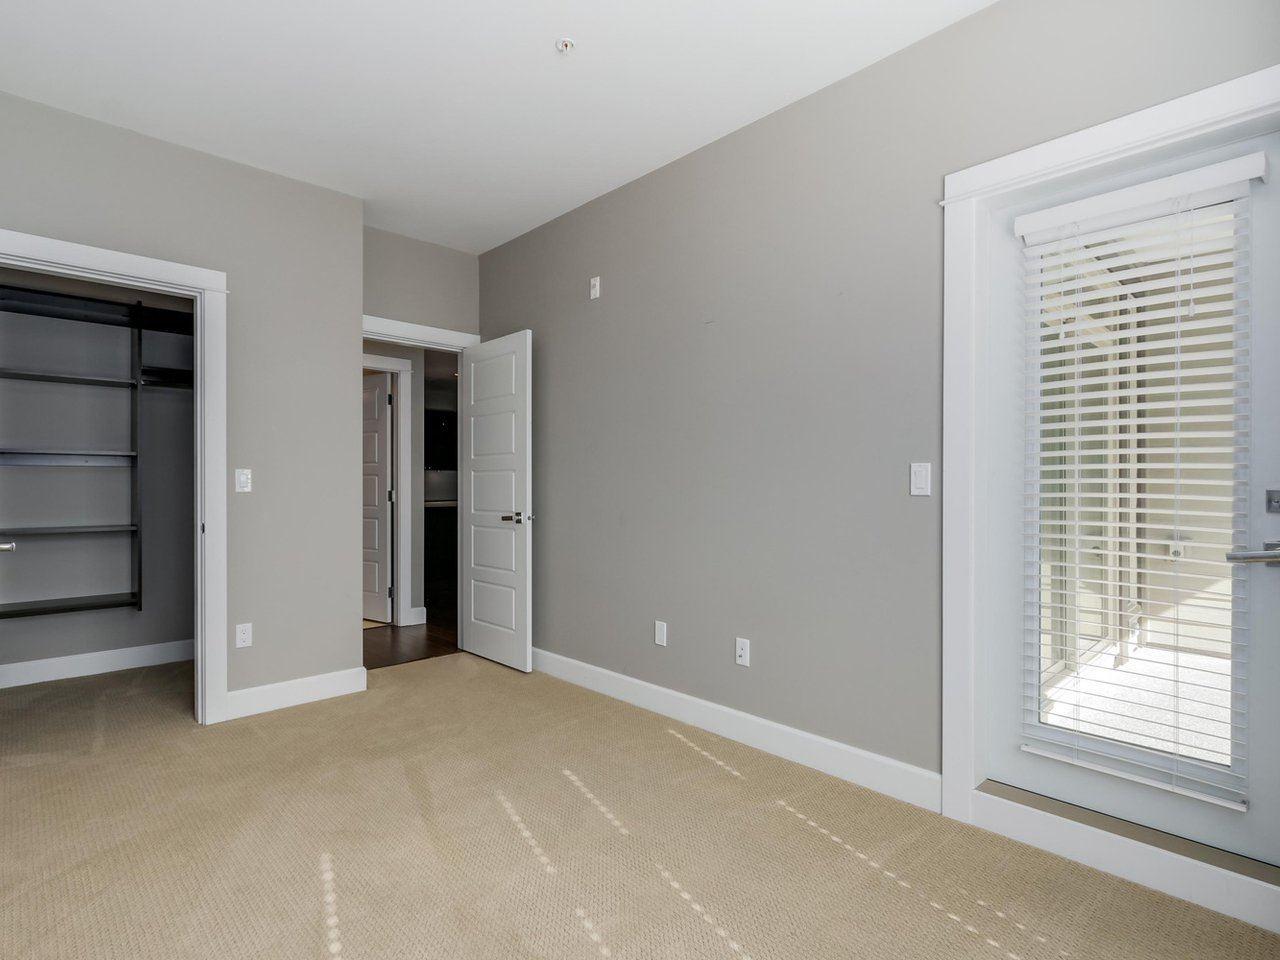 Condo Apartment at 206 15185 36 AVENUE, Unit 206, South Surrey White Rock, British Columbia. Image 10